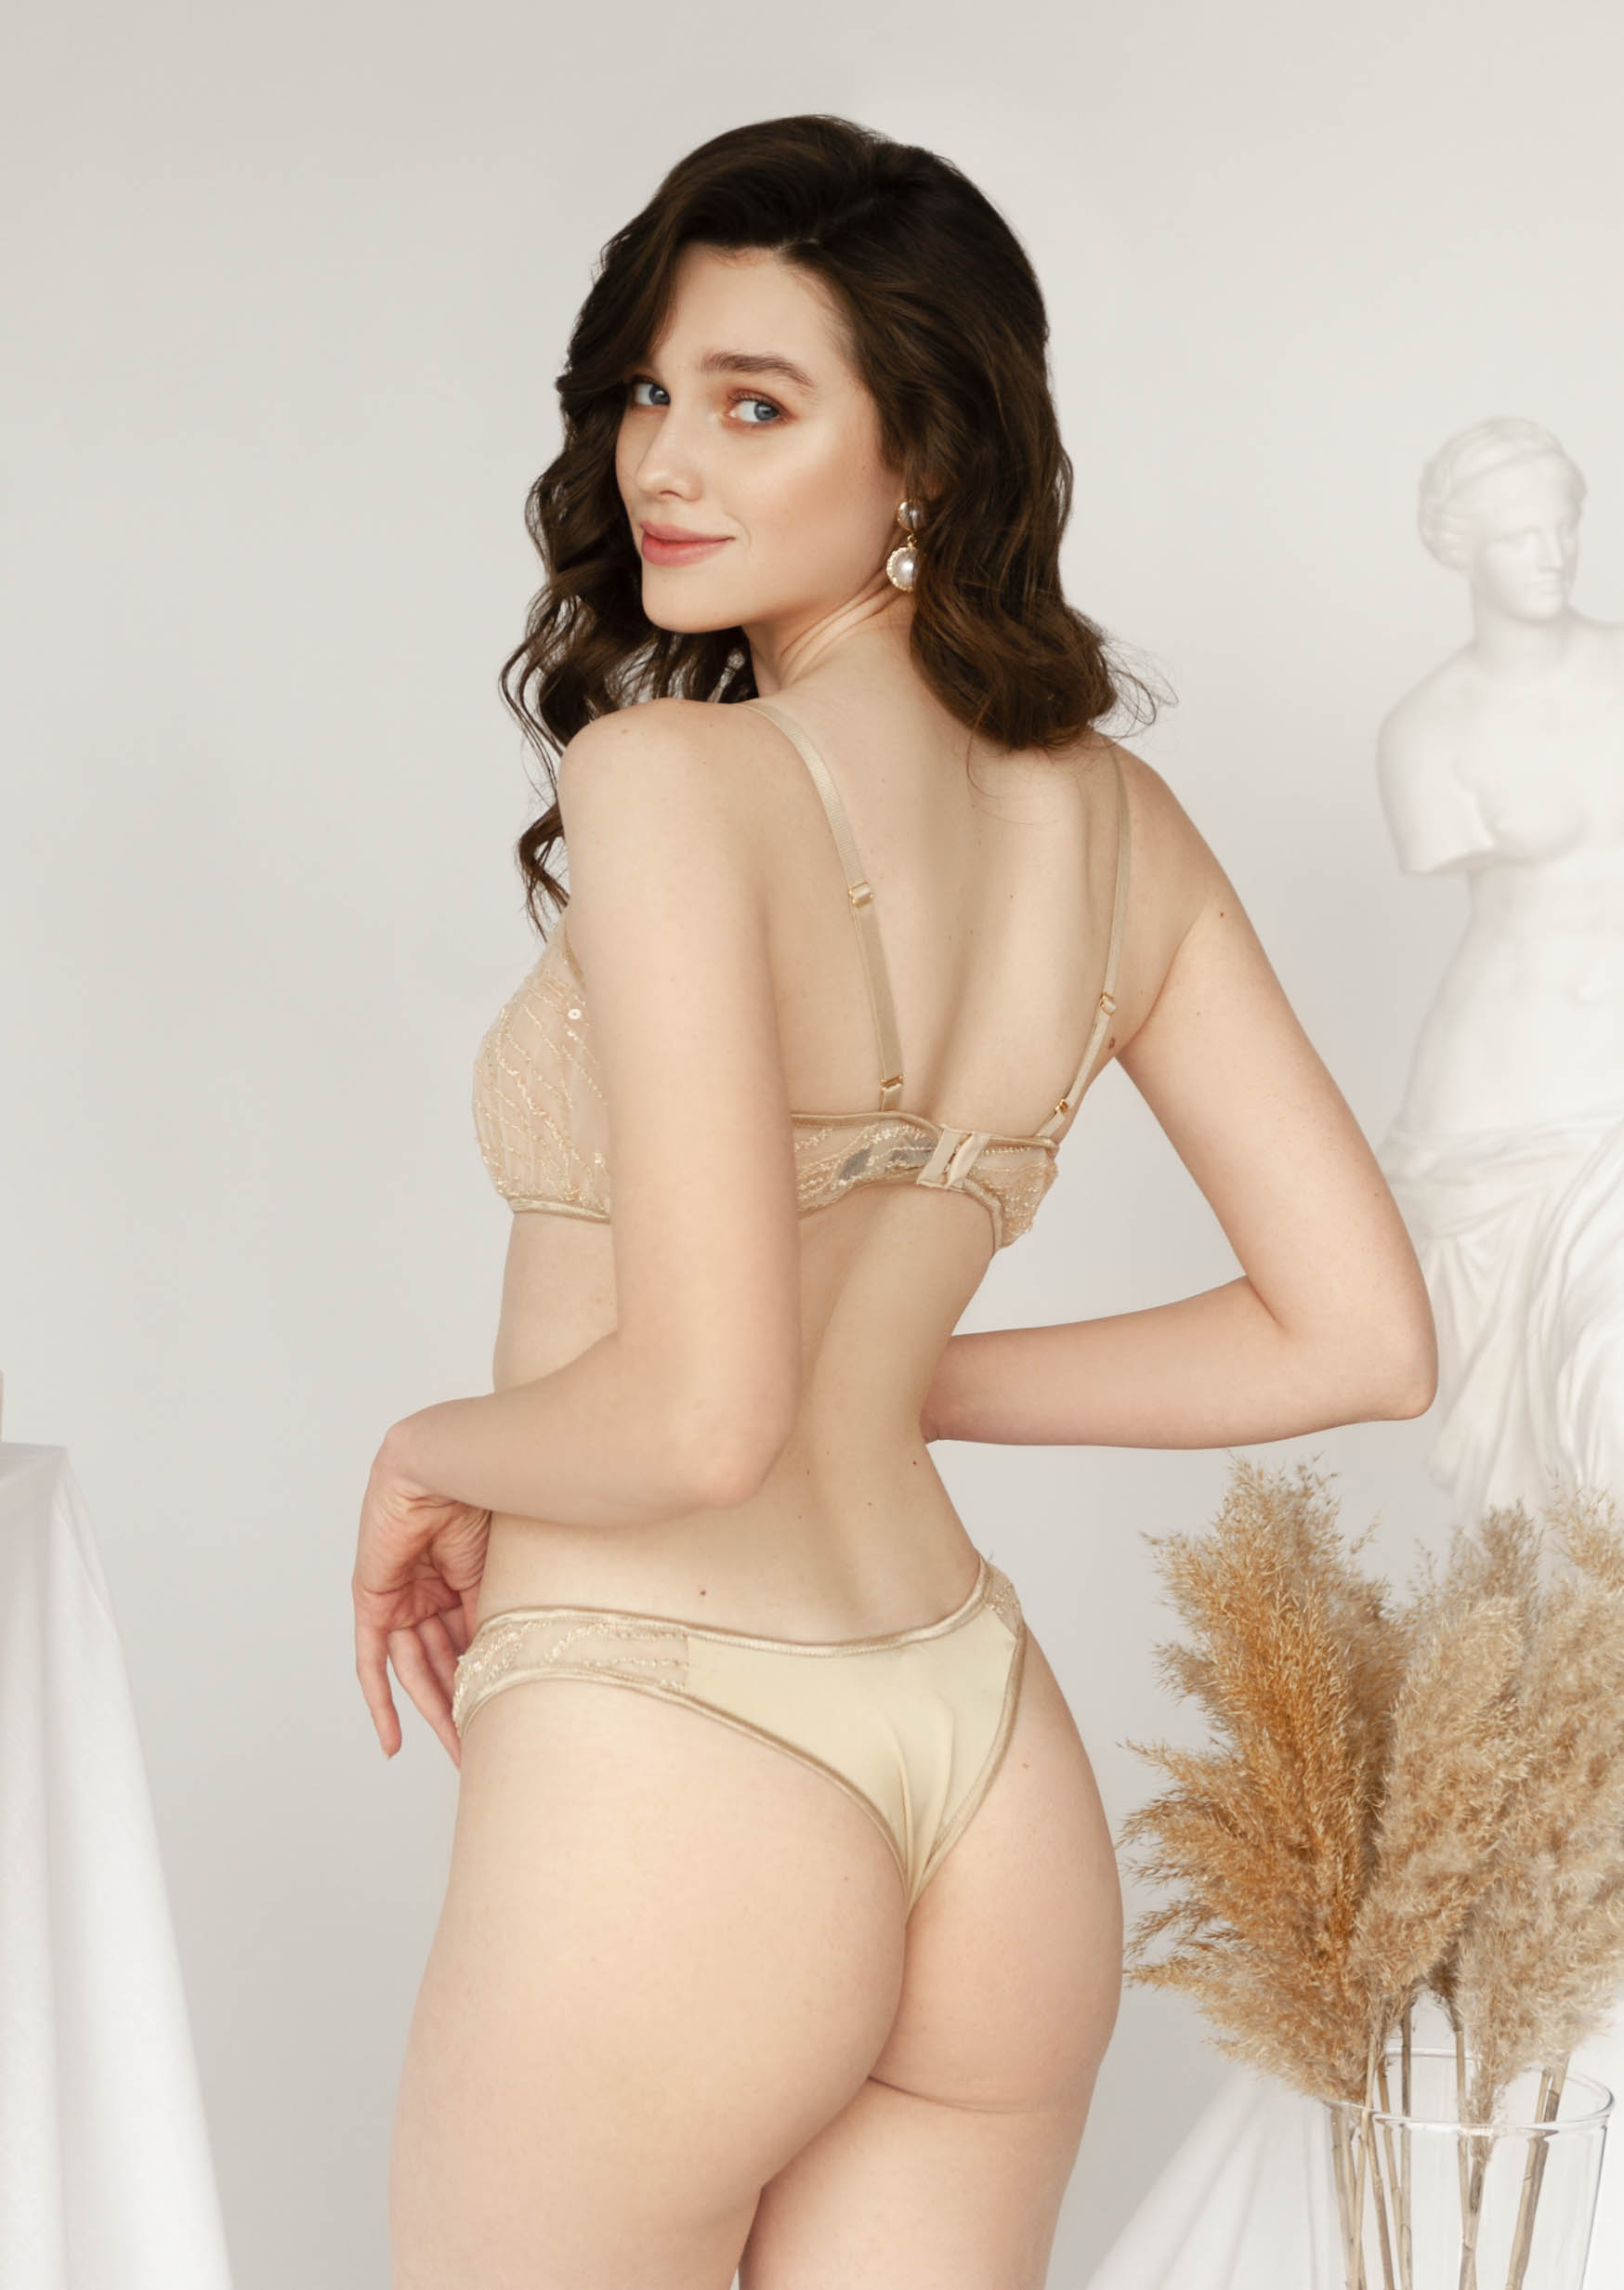 Golden sparkle lingerie set transparent lingerie with straps